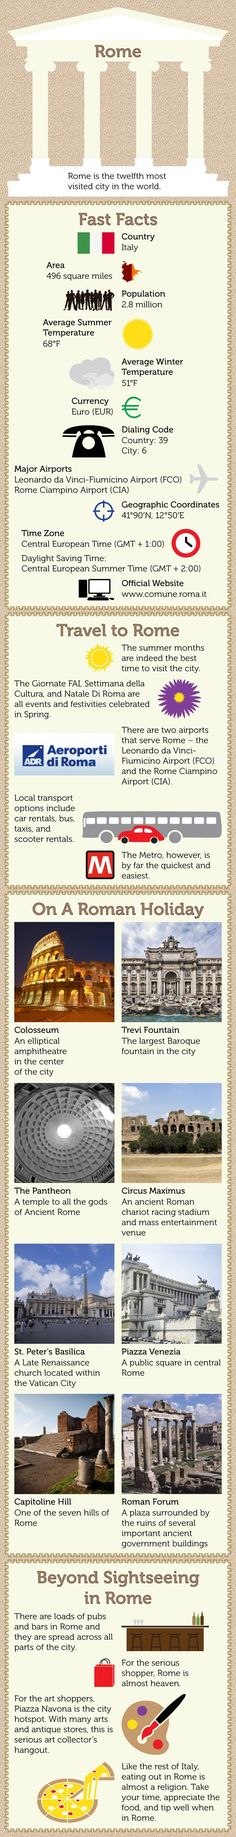 Rome Travel Infographic